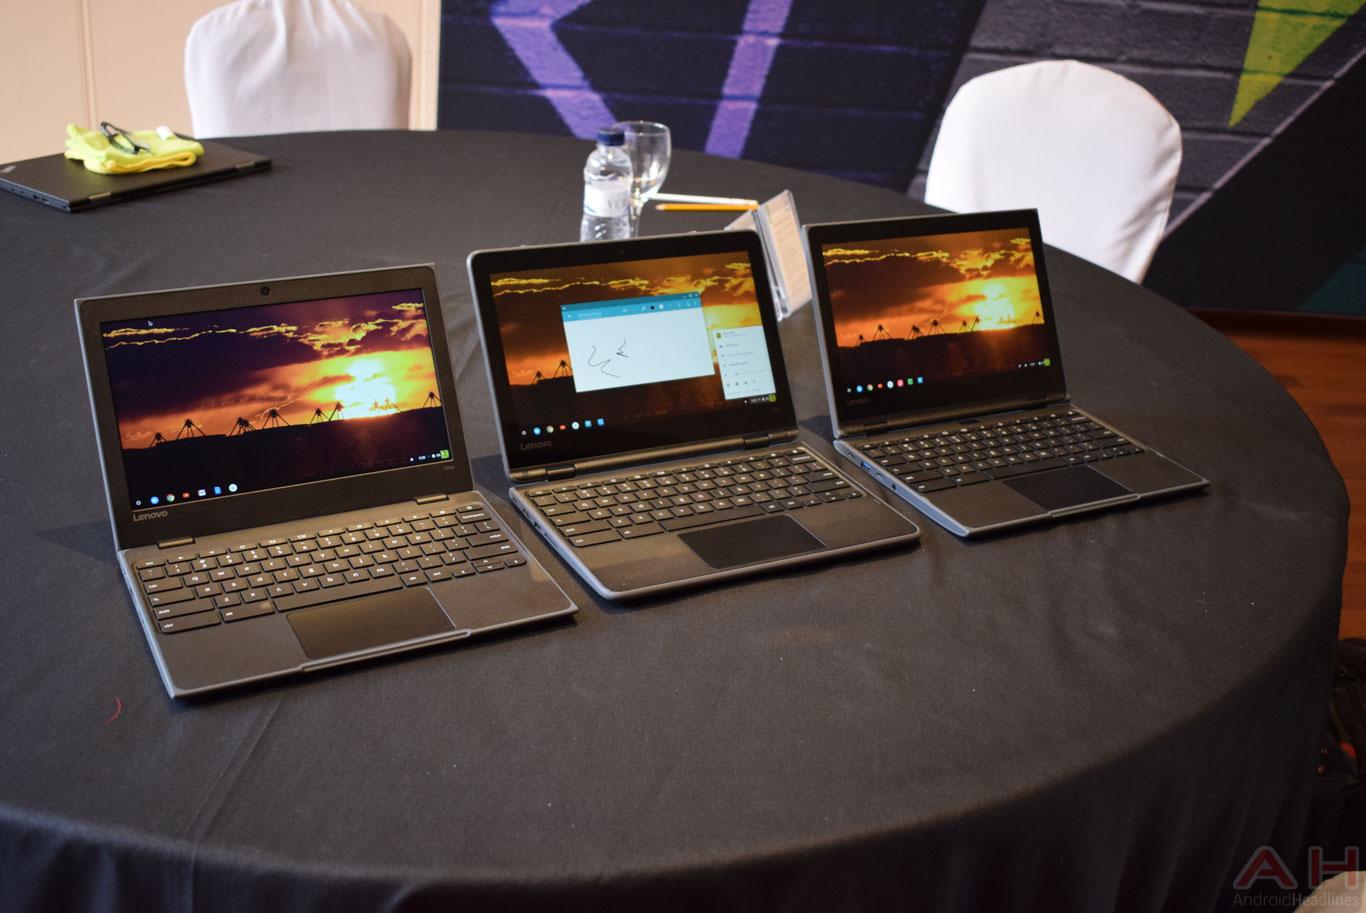 Lenovo-Chromebook-500E-MWC-18-AM-AH-7